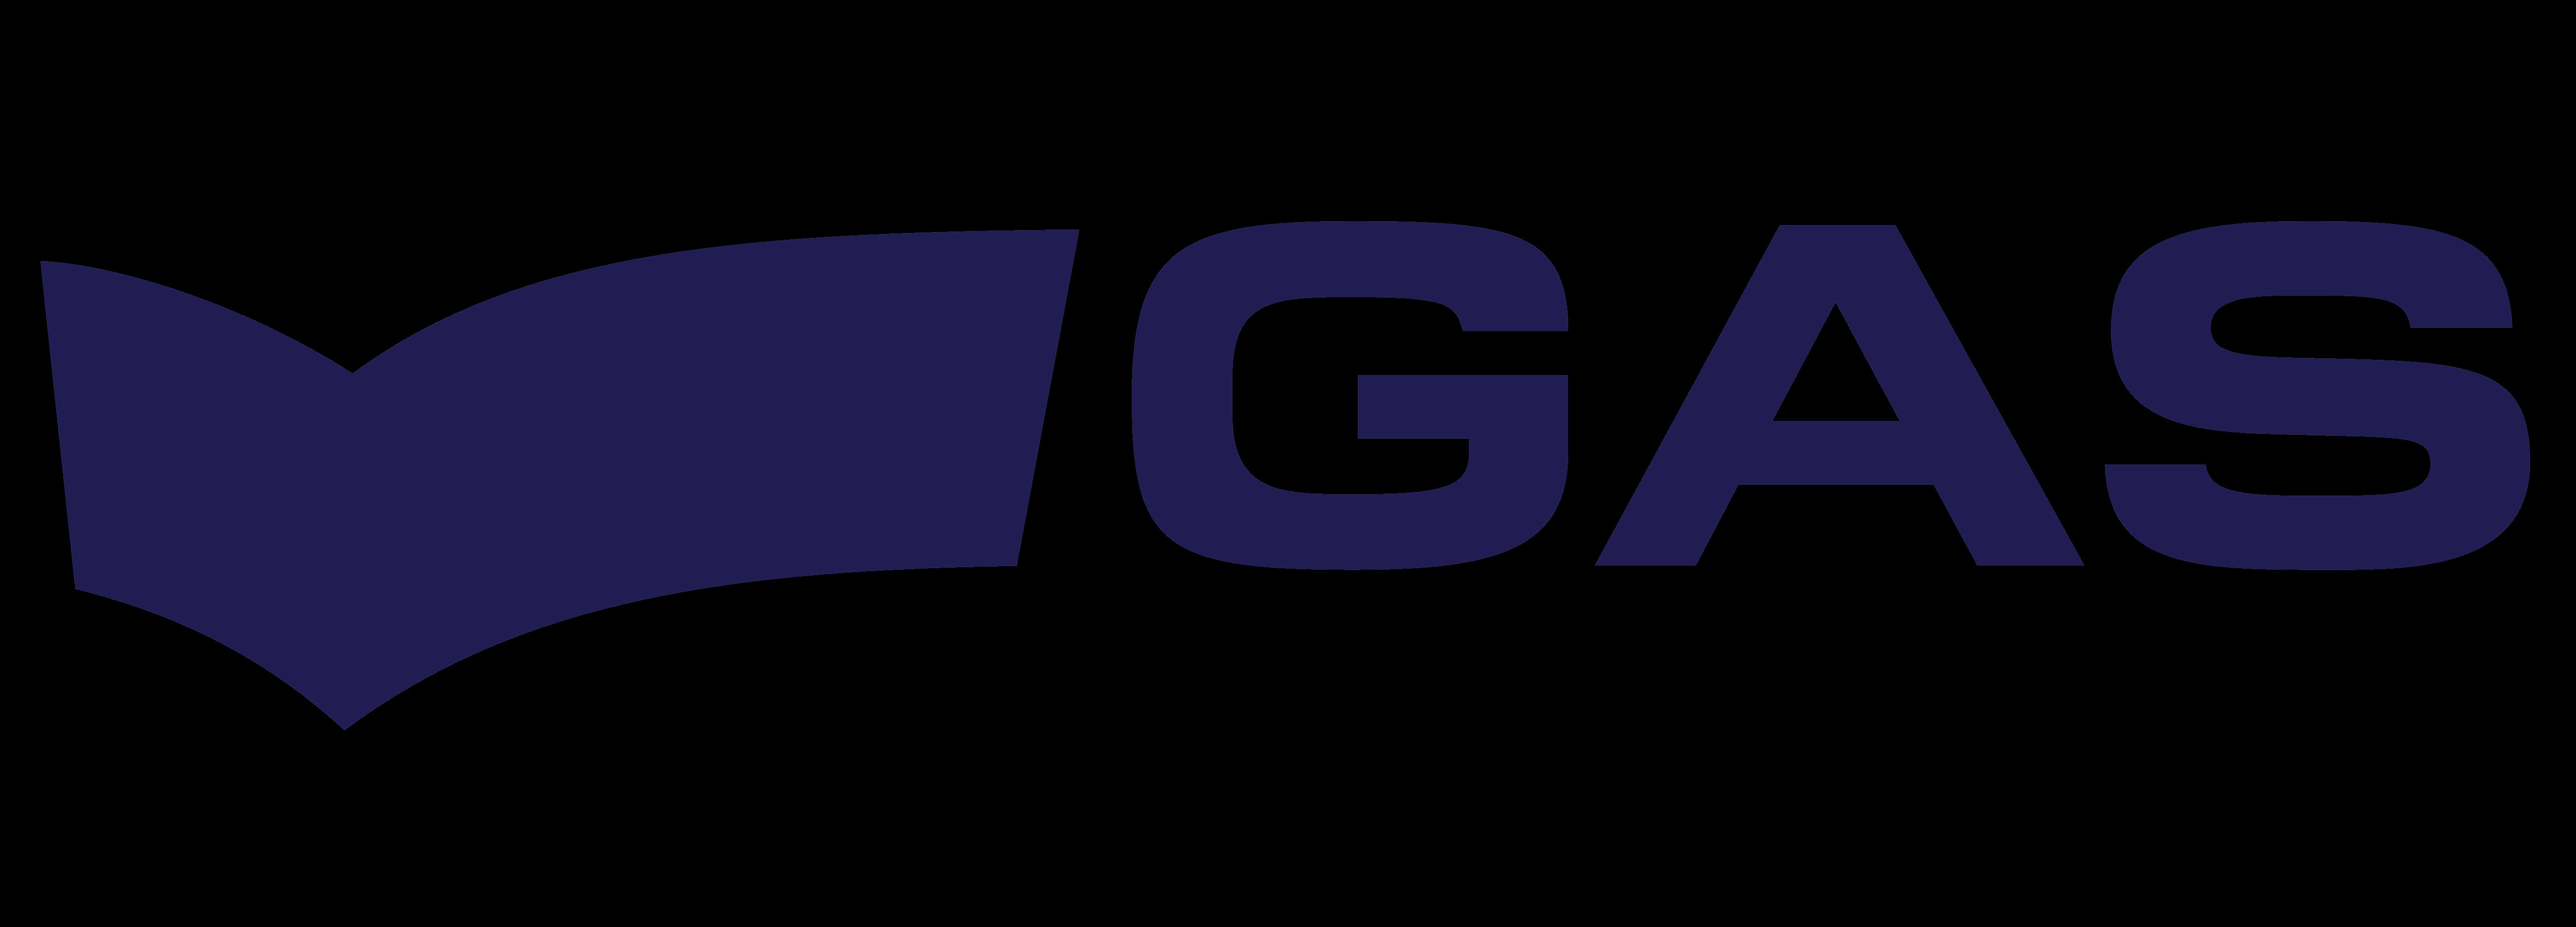 GAS Jeans – Logos Download